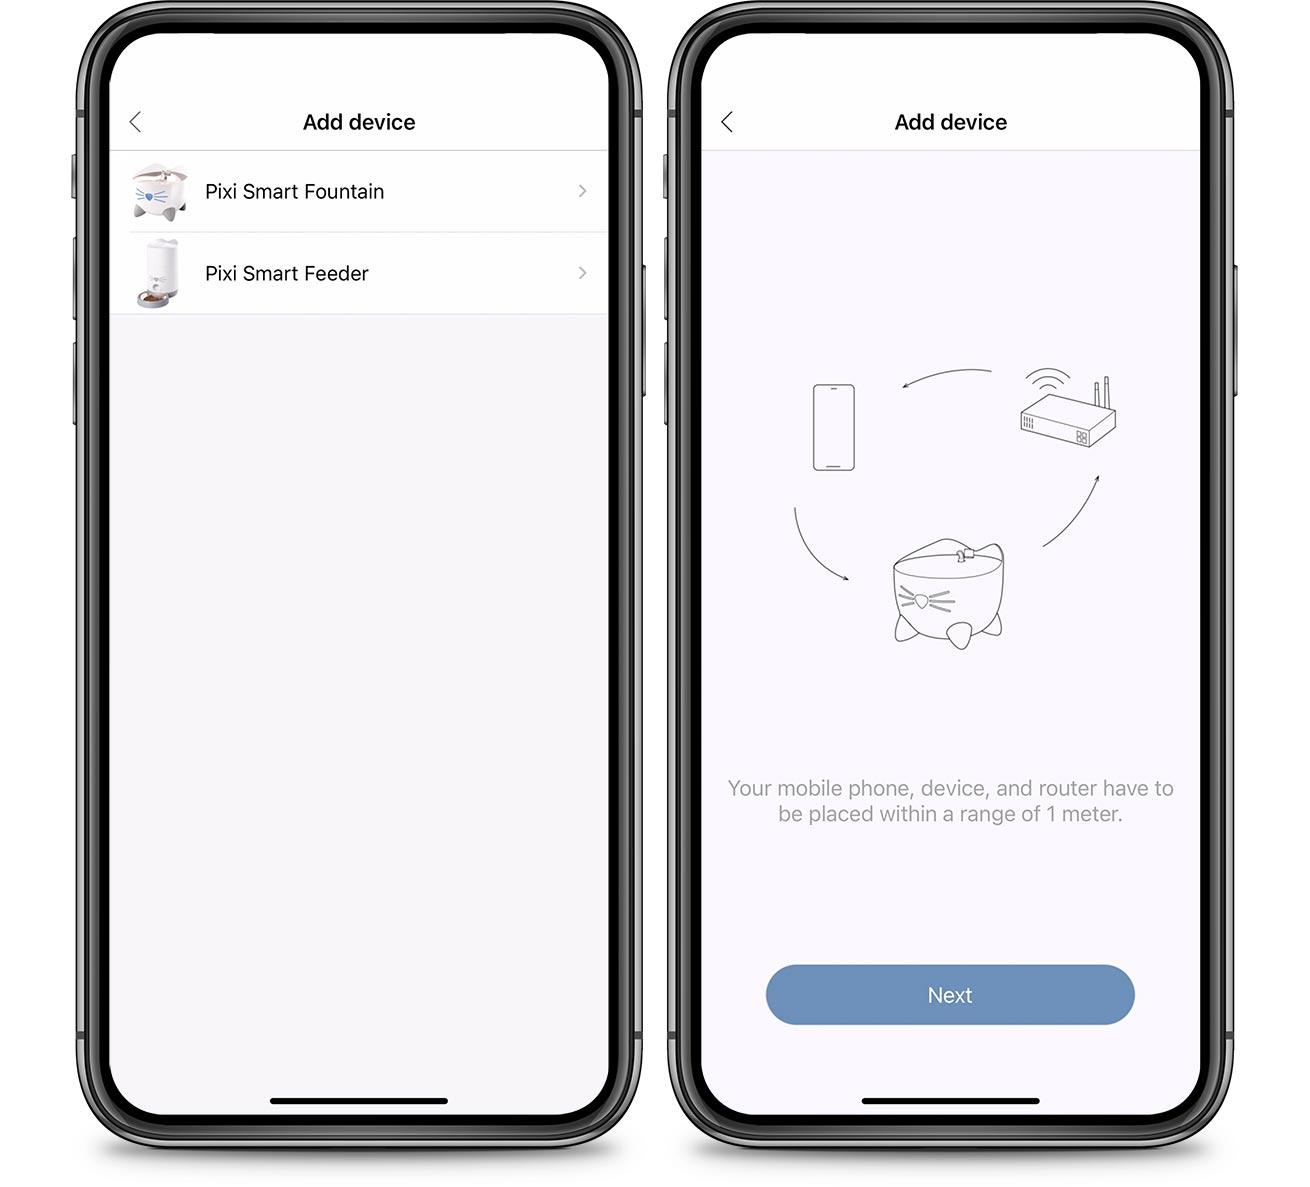 PIXI App Add device instructions